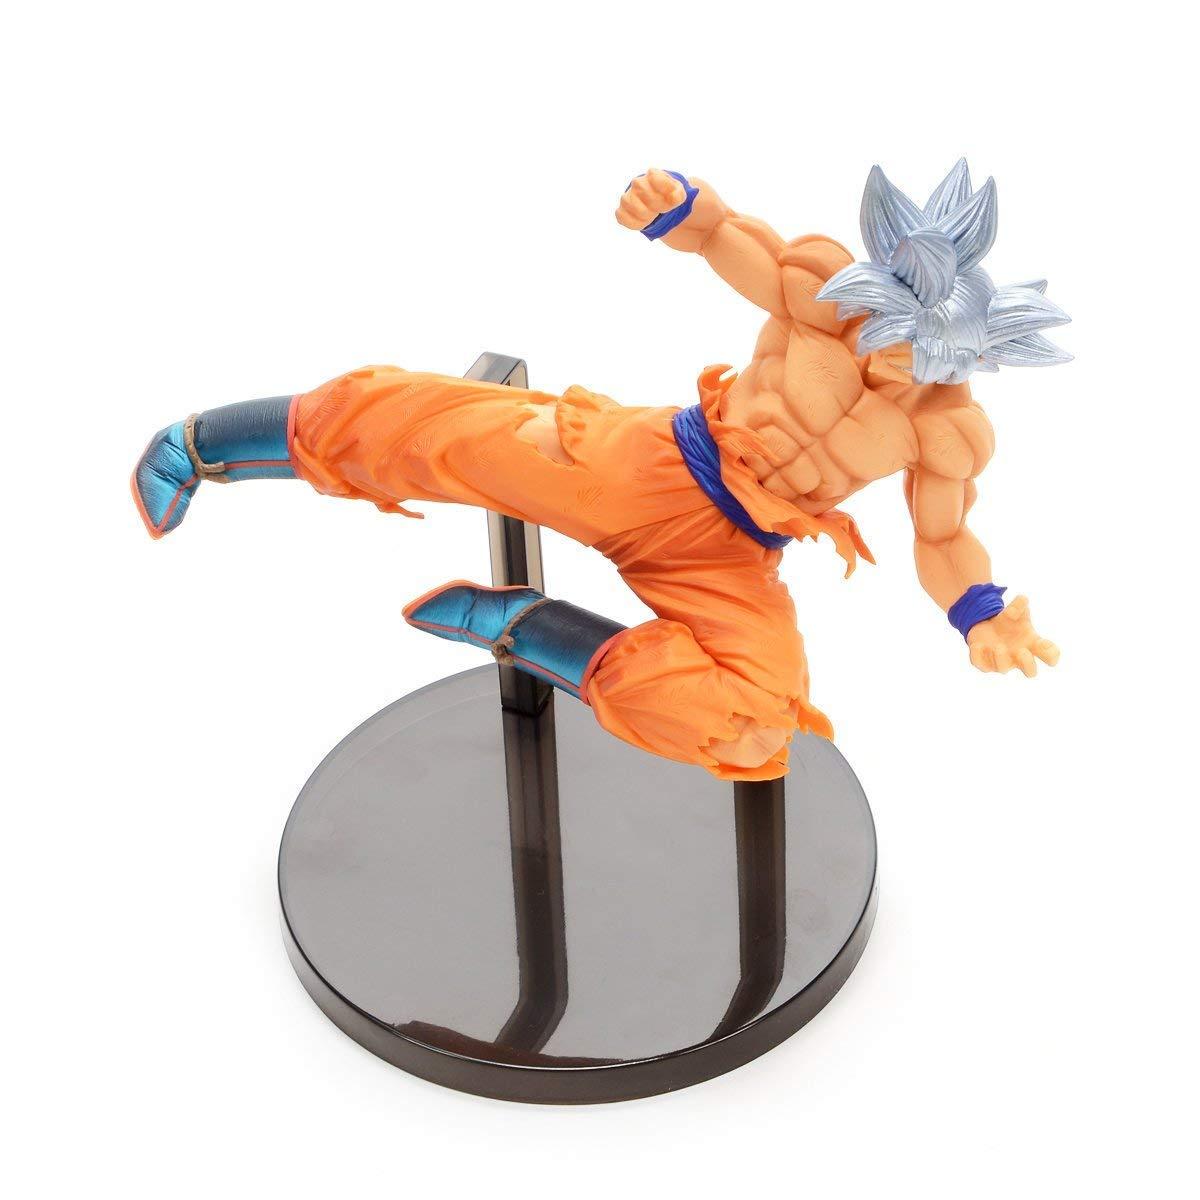 A: Ultra Instinct Ct Toy Banpresto Dragonball Super Son Gokou FES! Vol.8 Orange NON